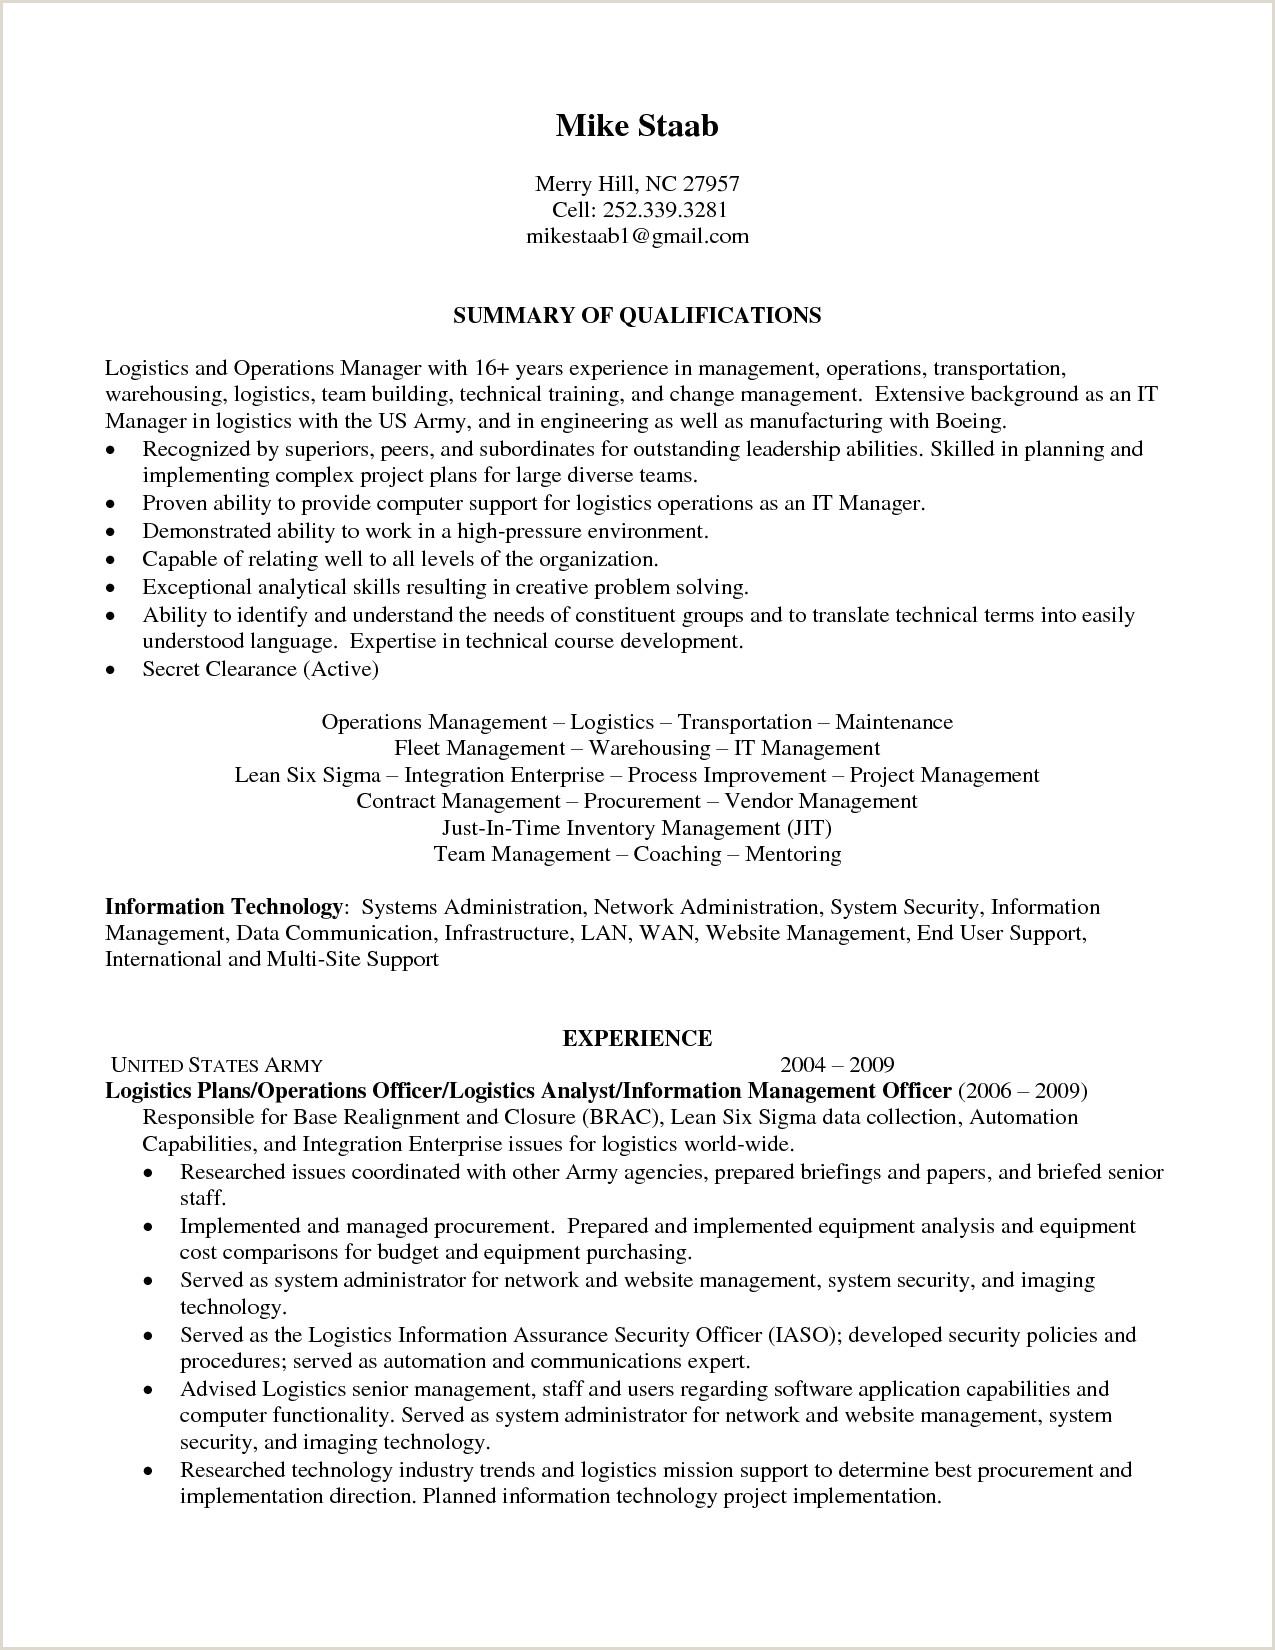 Fresher Resume format for Logistics Senior Logistic Management Resume